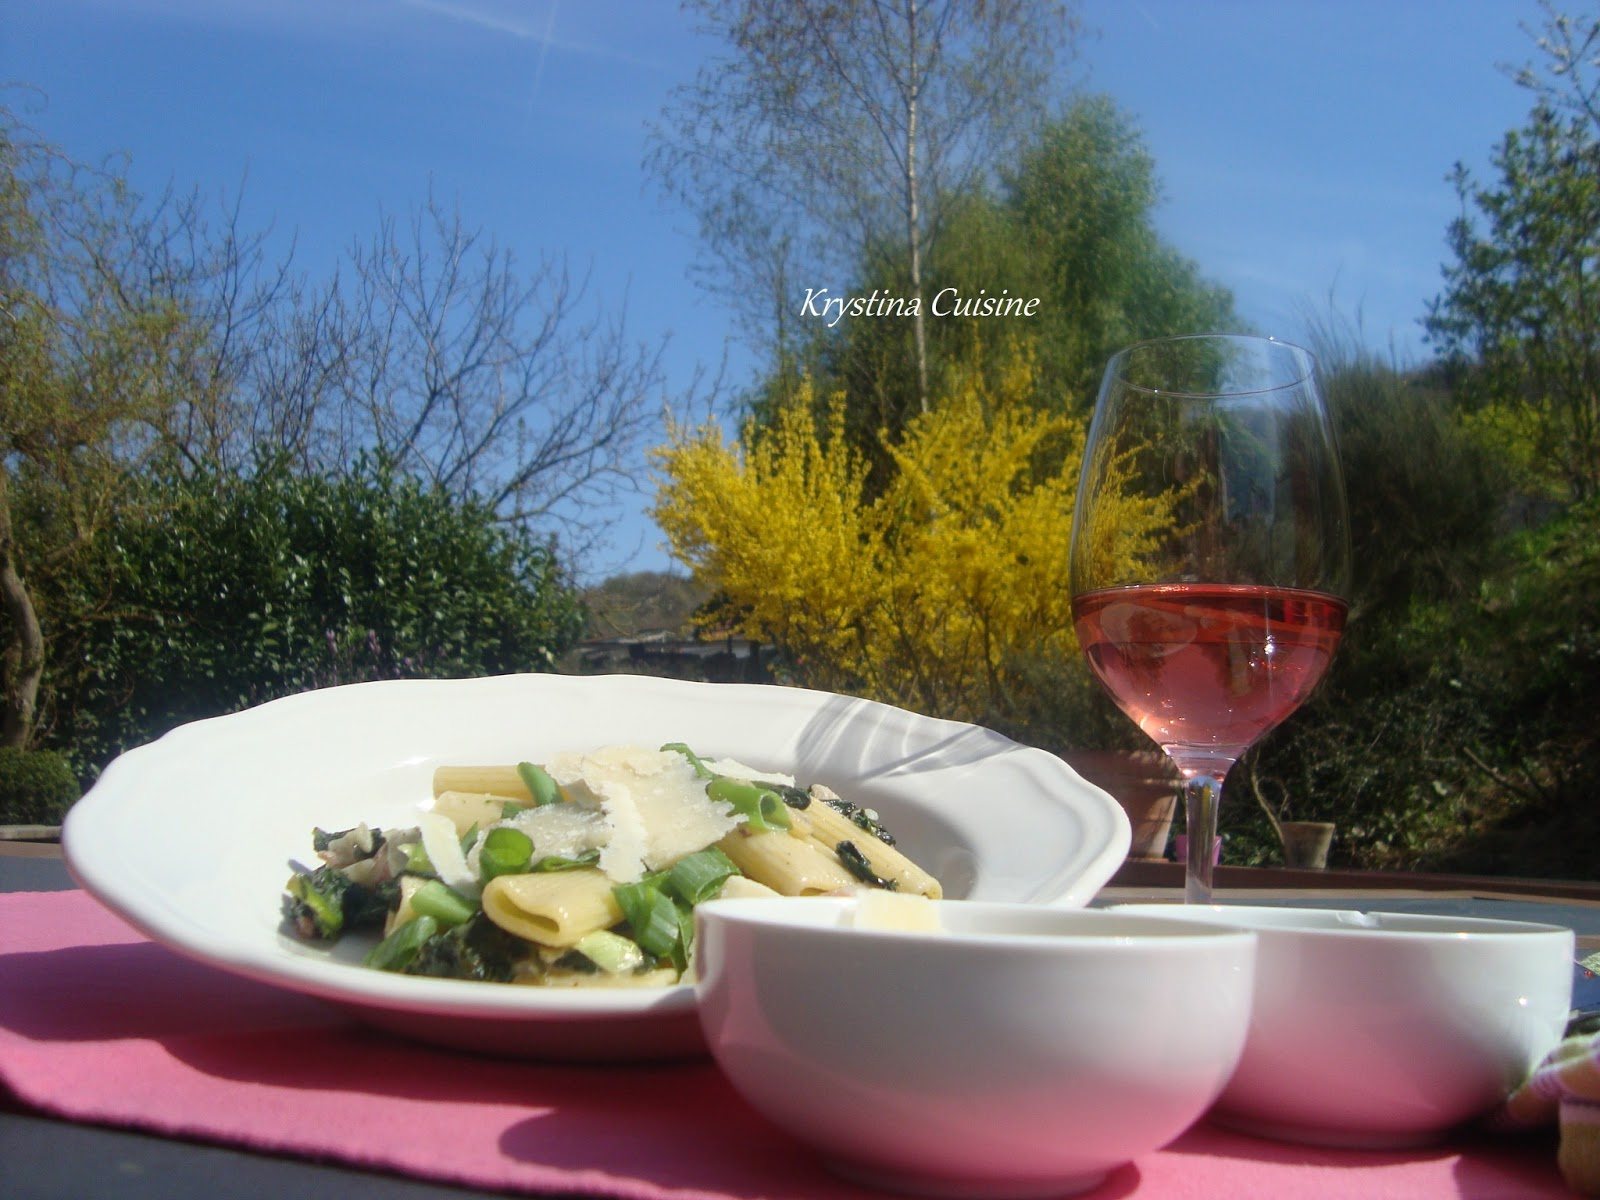 Krystina cuisine rigatoni n 24 la krystina cuisine for Allez cuisine translation